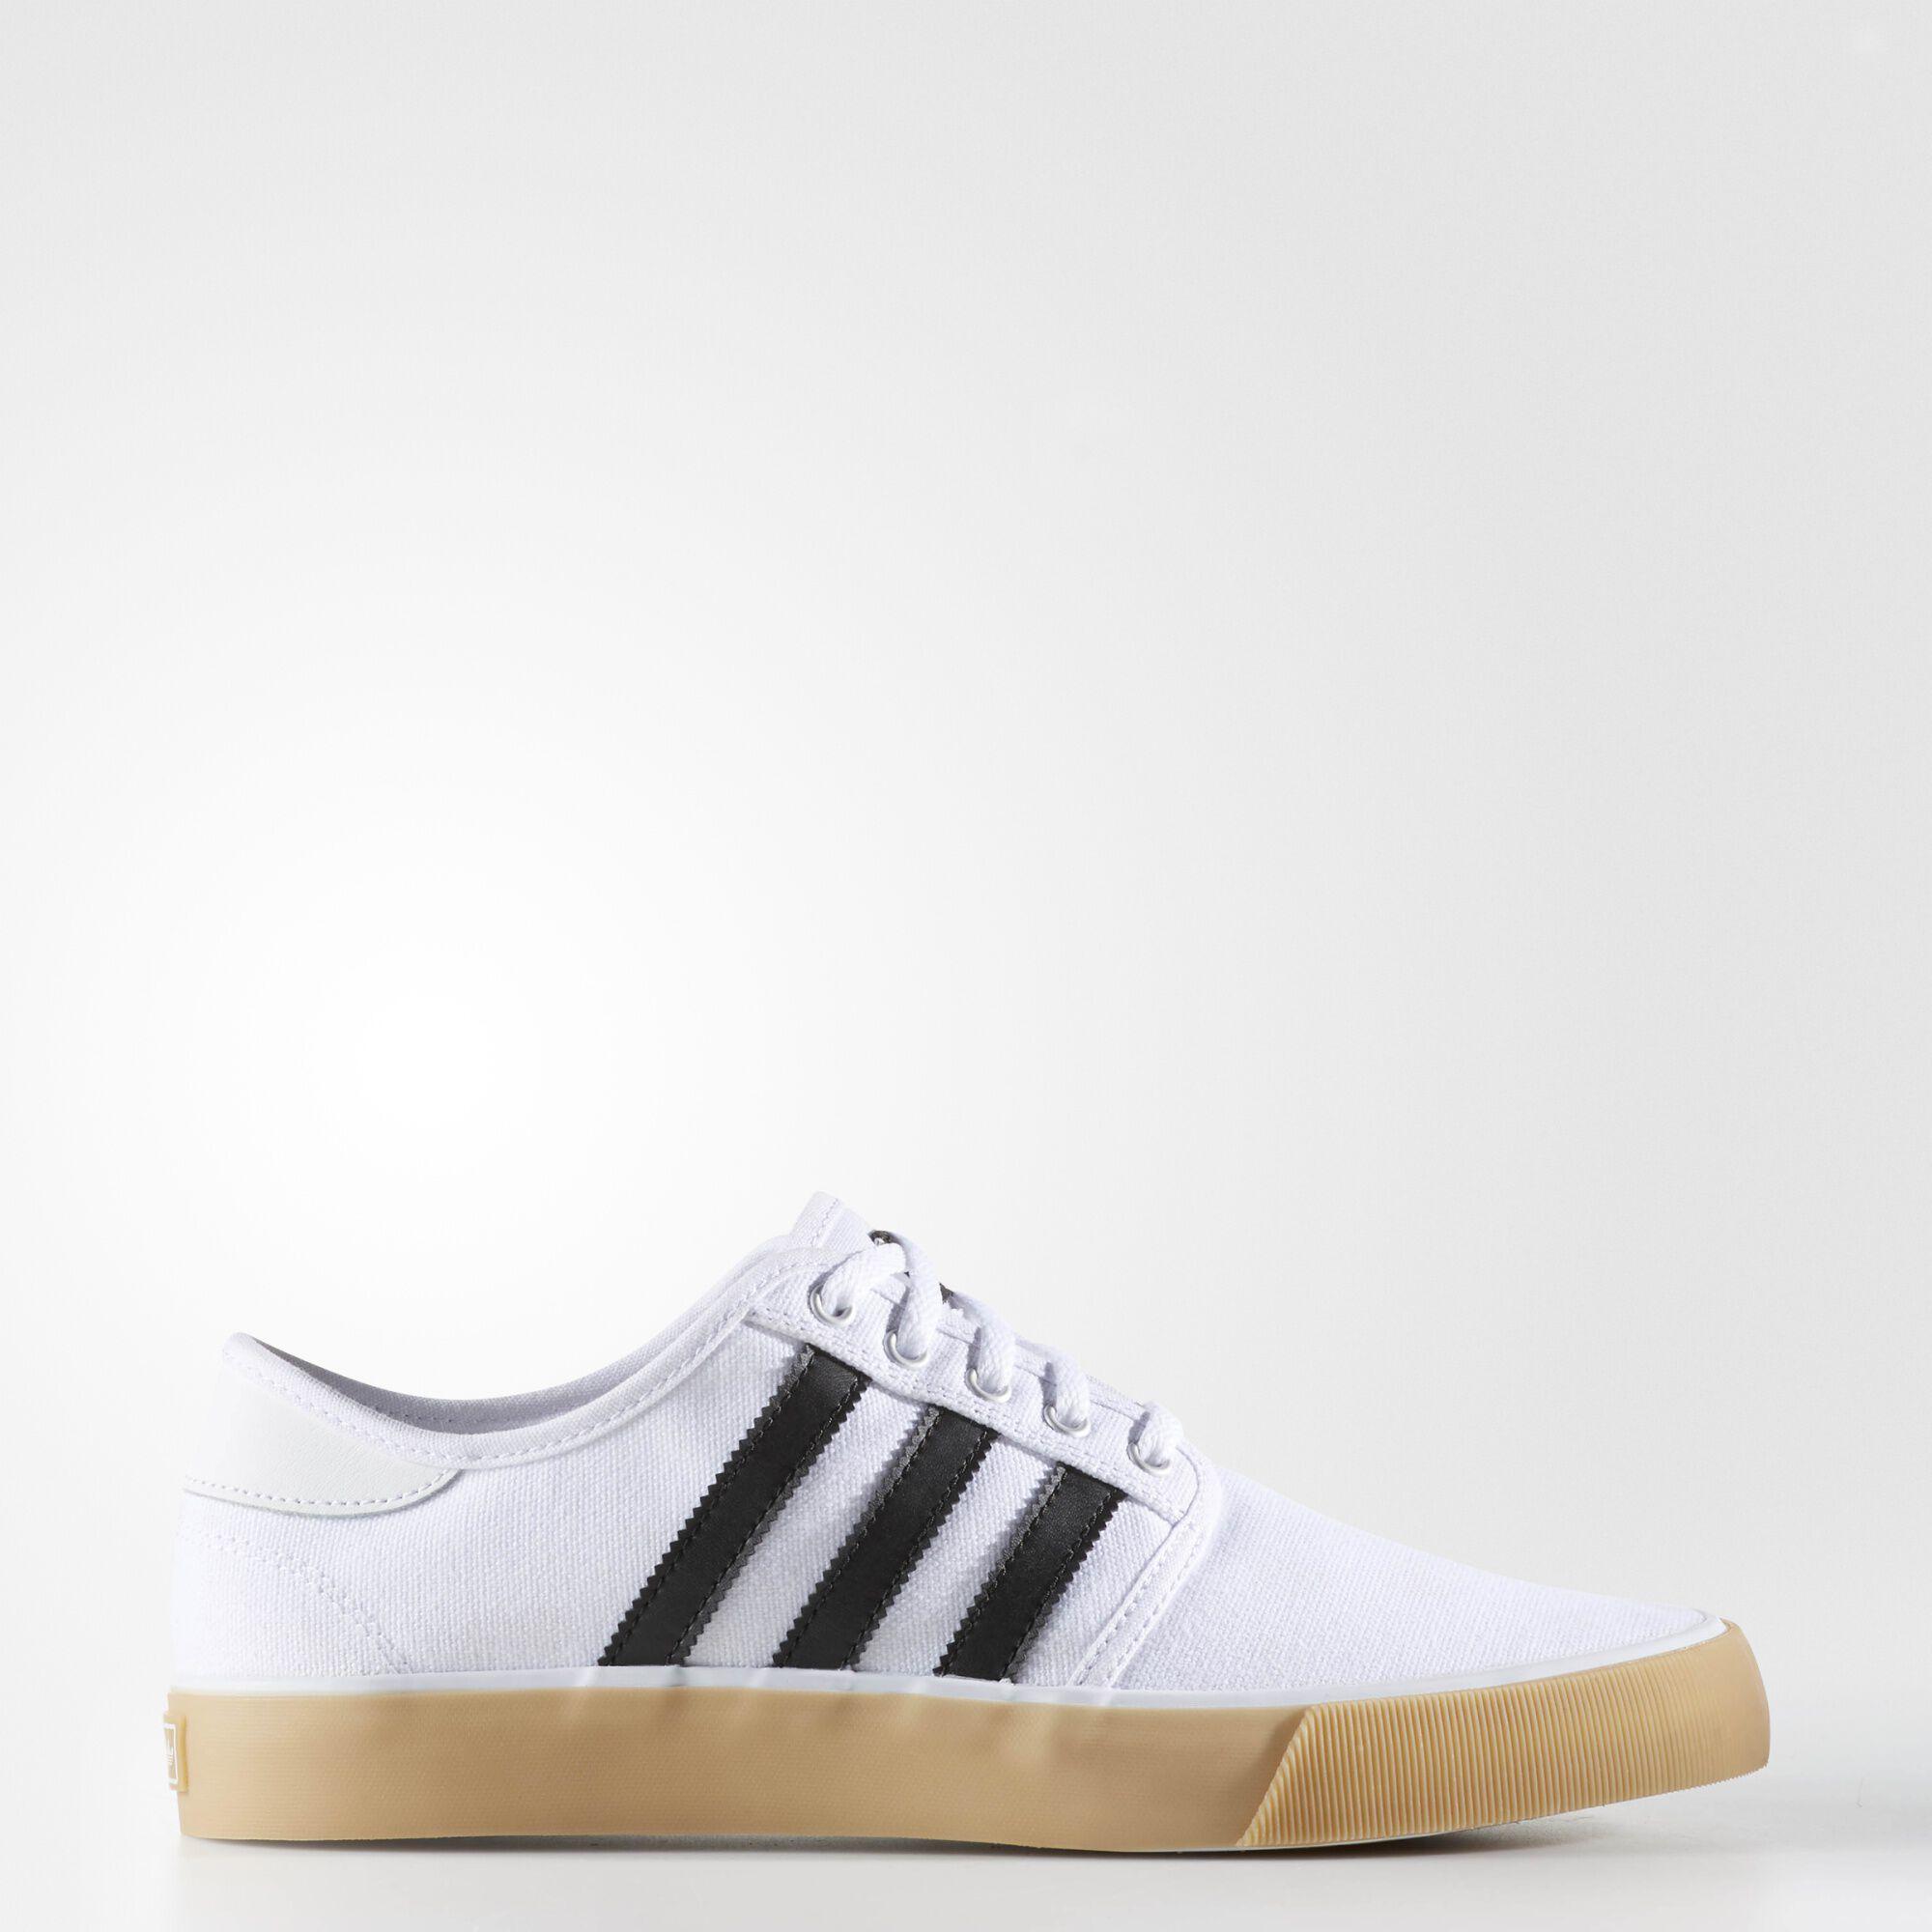 Adidas skate shoes zumiez - Adidas Seeley Essentials Shoes Running White Ftw Black Running White Bb8560